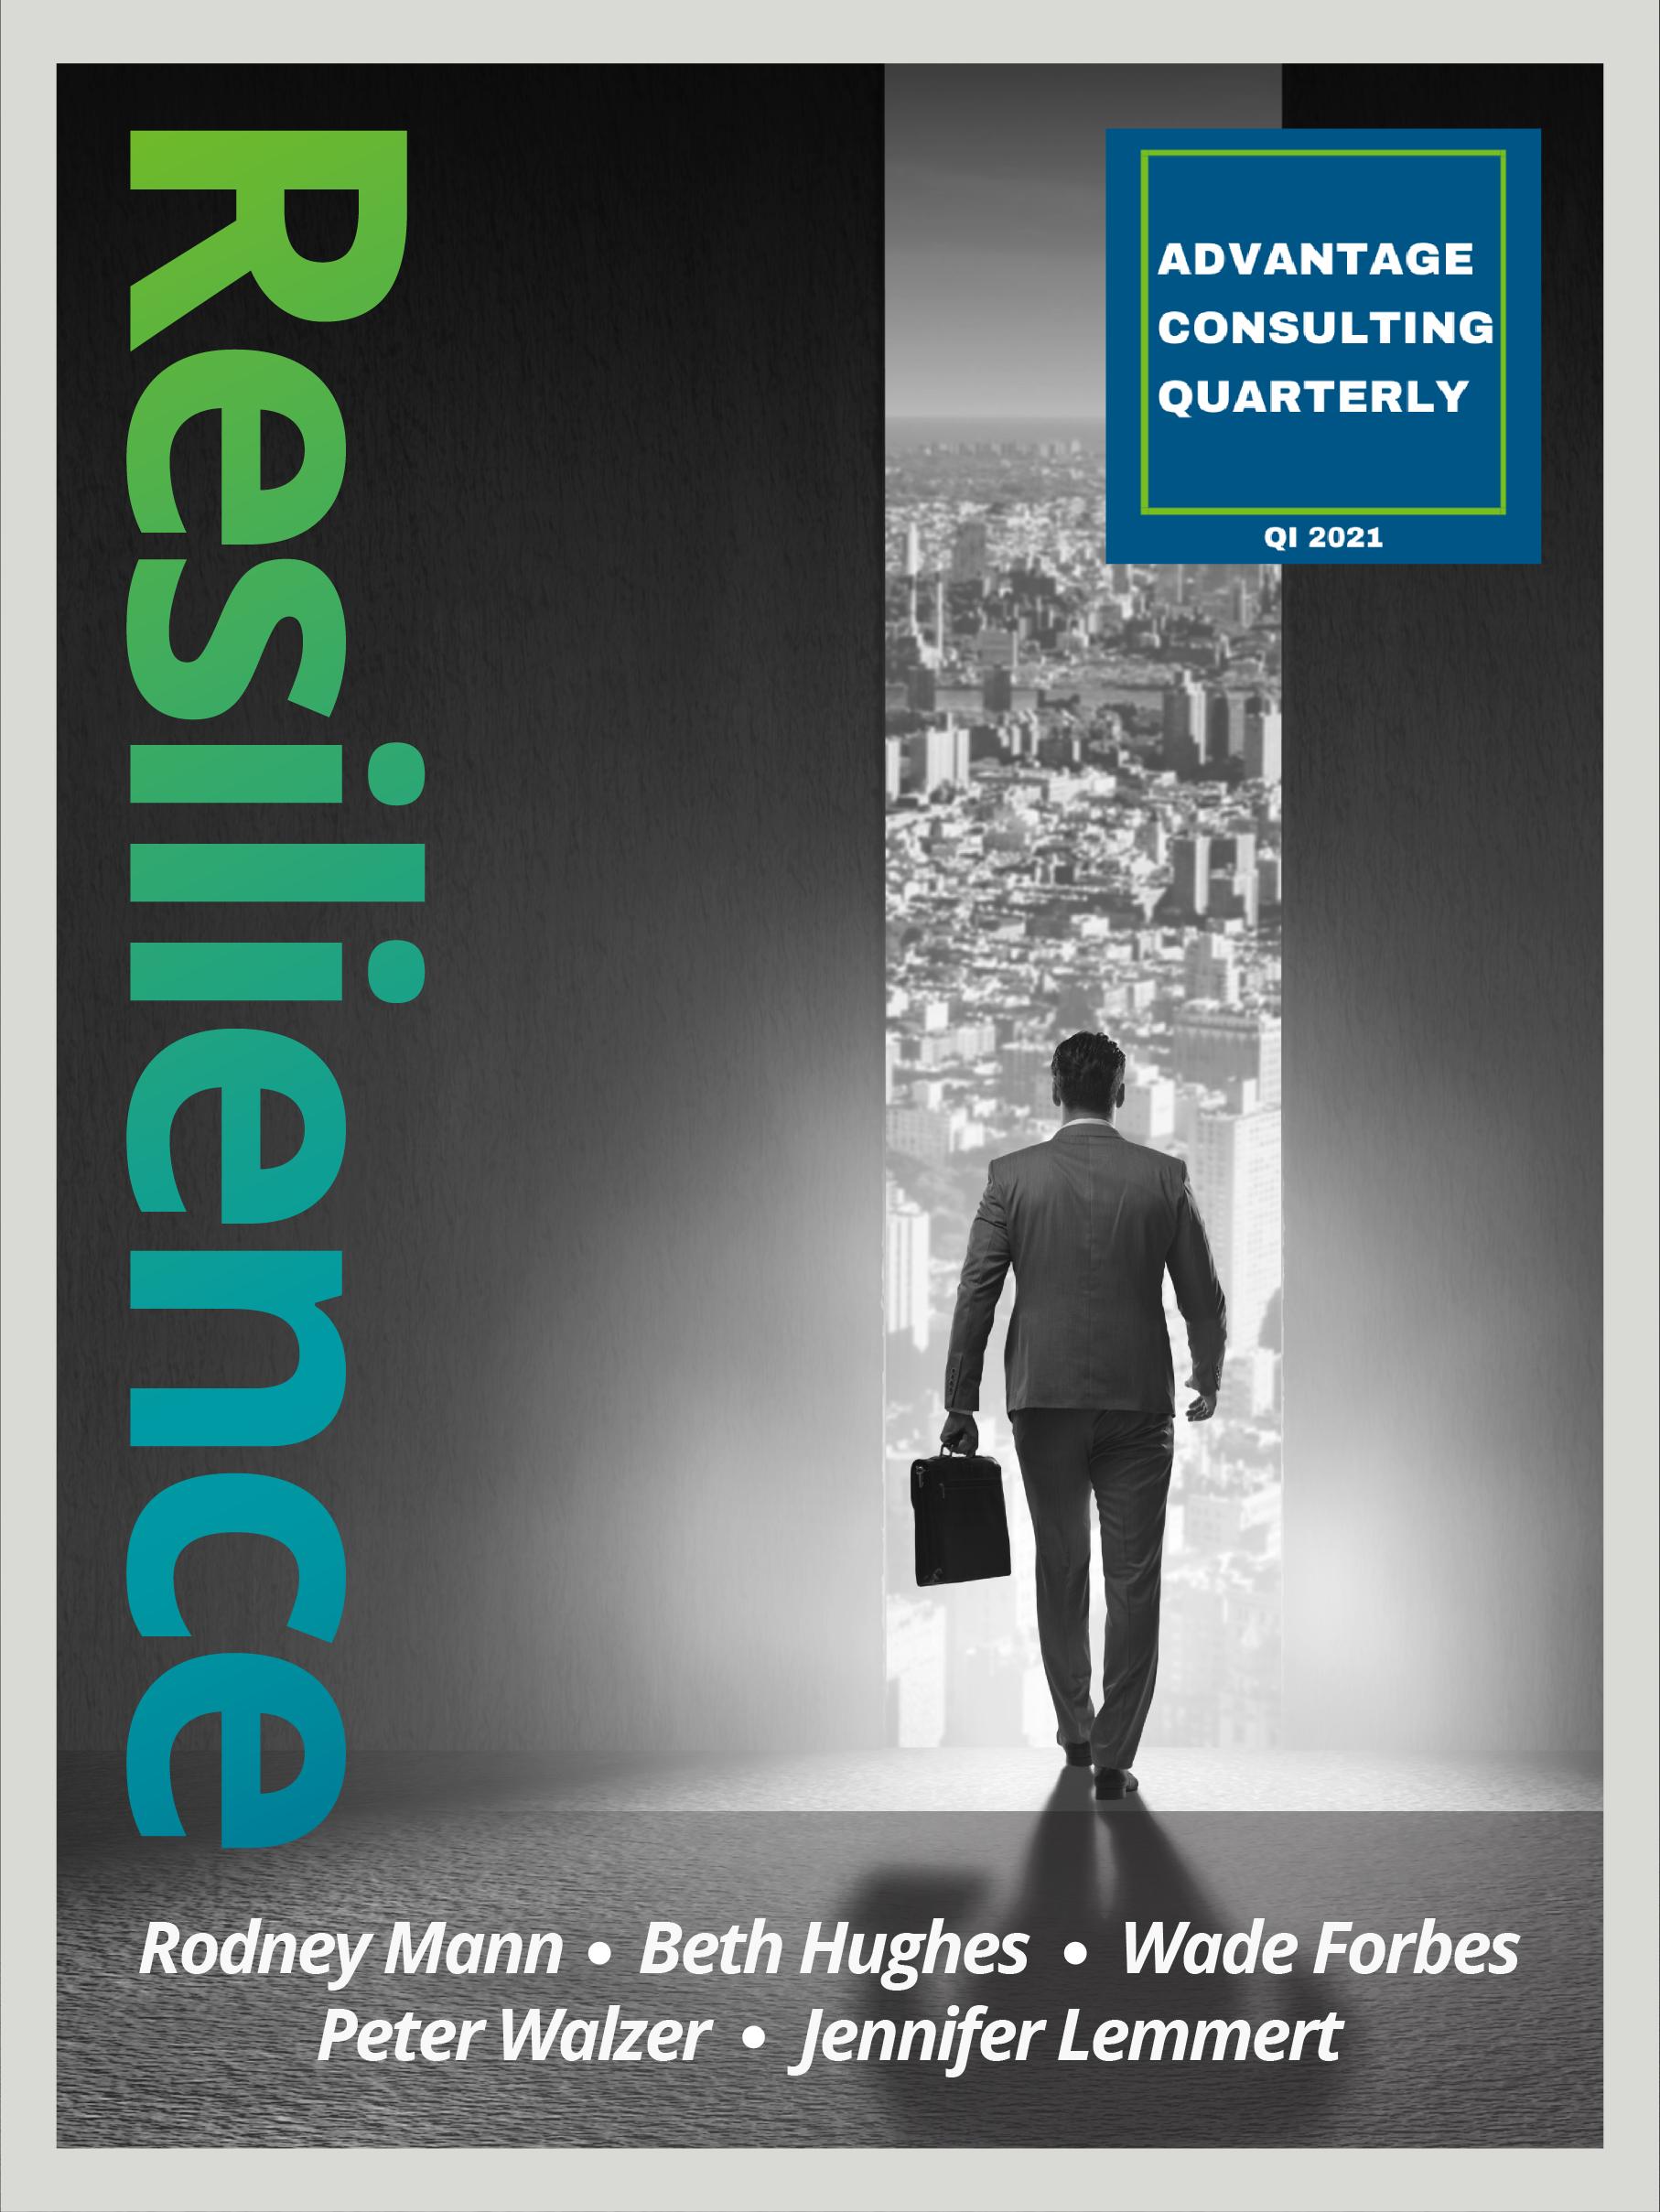 Advantage consulting quarterly Q1